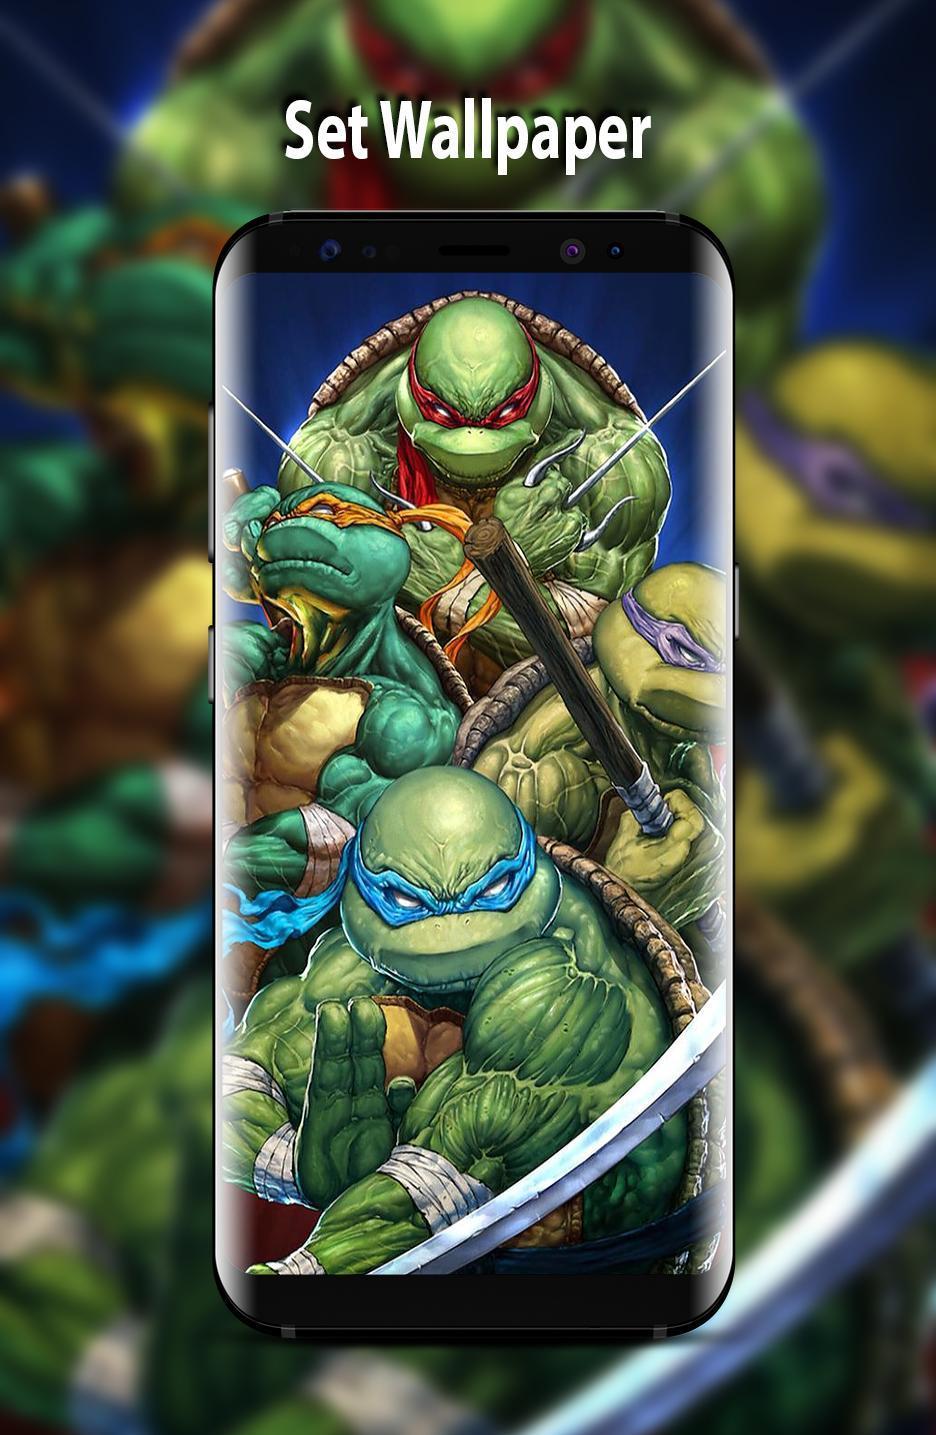 Ninja Turtles Wallpaper Hd For Android Apk Download